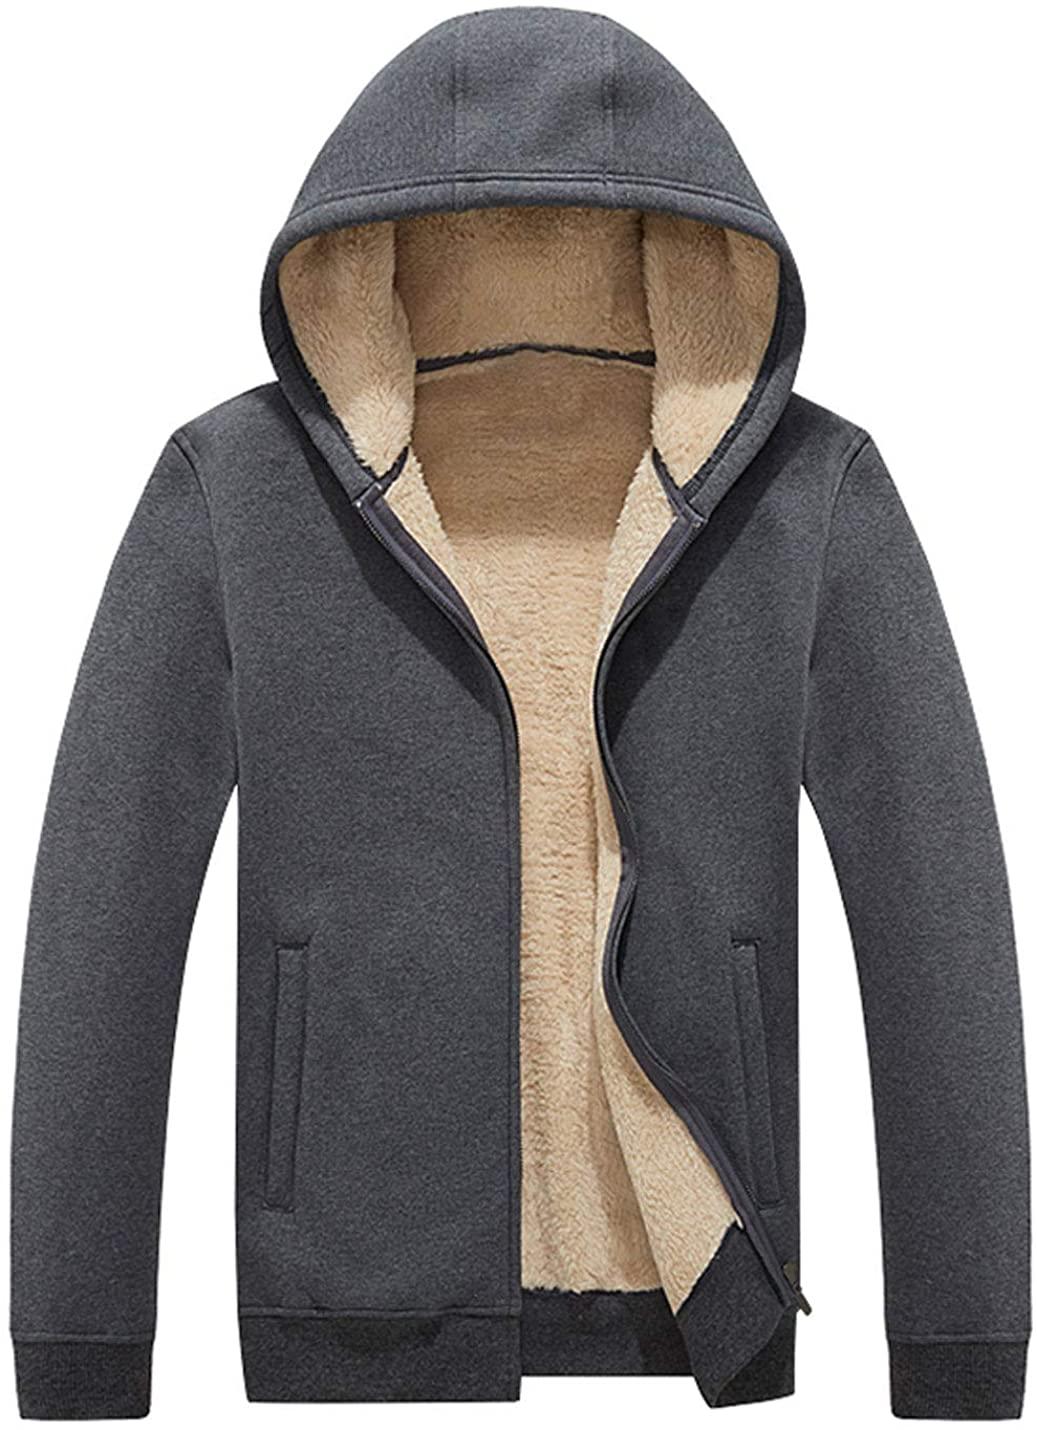 Flygo Men's Casual Wimter Thicken Lamb Cashmere Fleece Sherpa Lined Full-Zip Hoodies Sweatshirt Jackets Outerwear